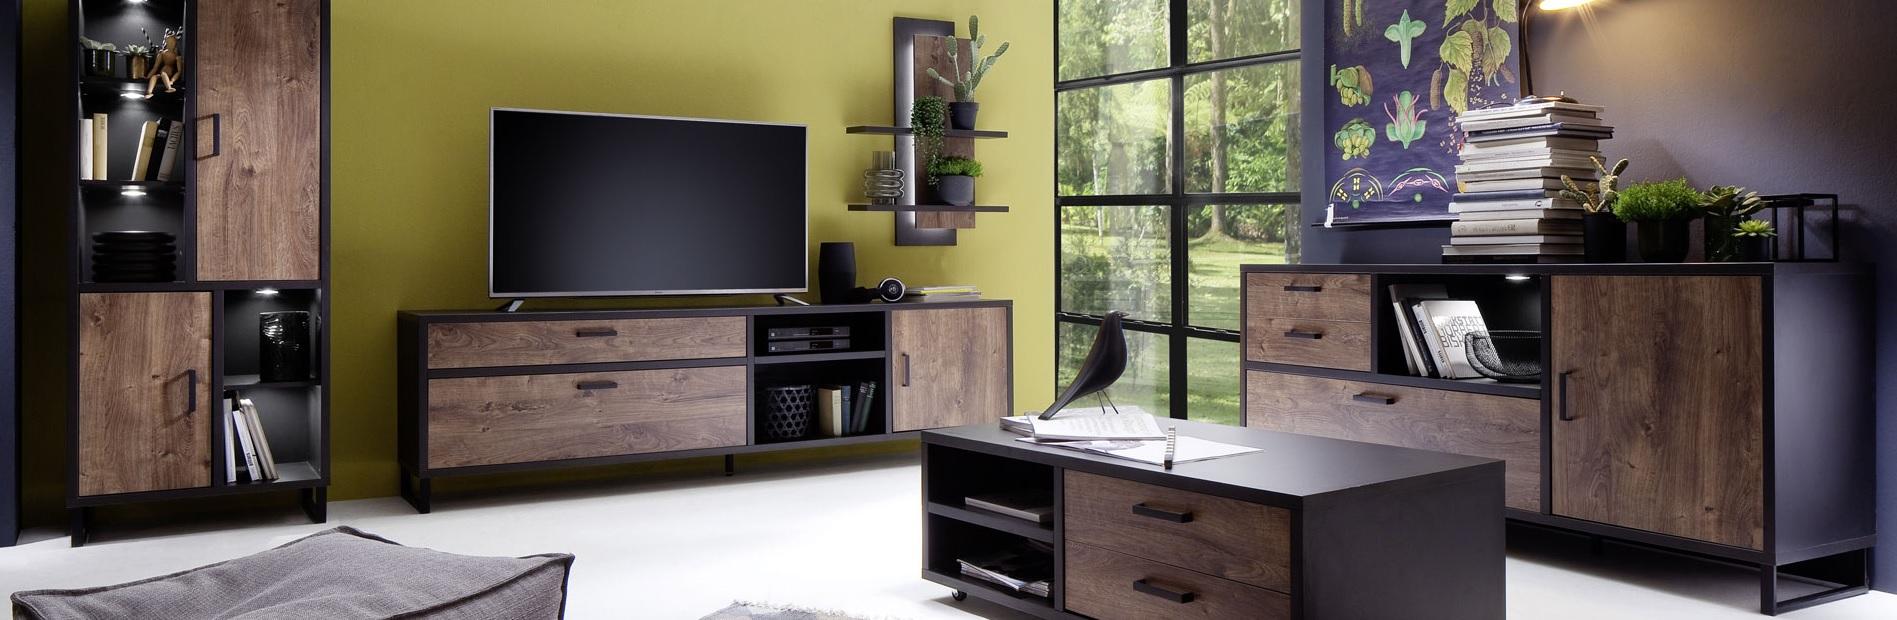 Top 10 Furniture Online Brands in the UK